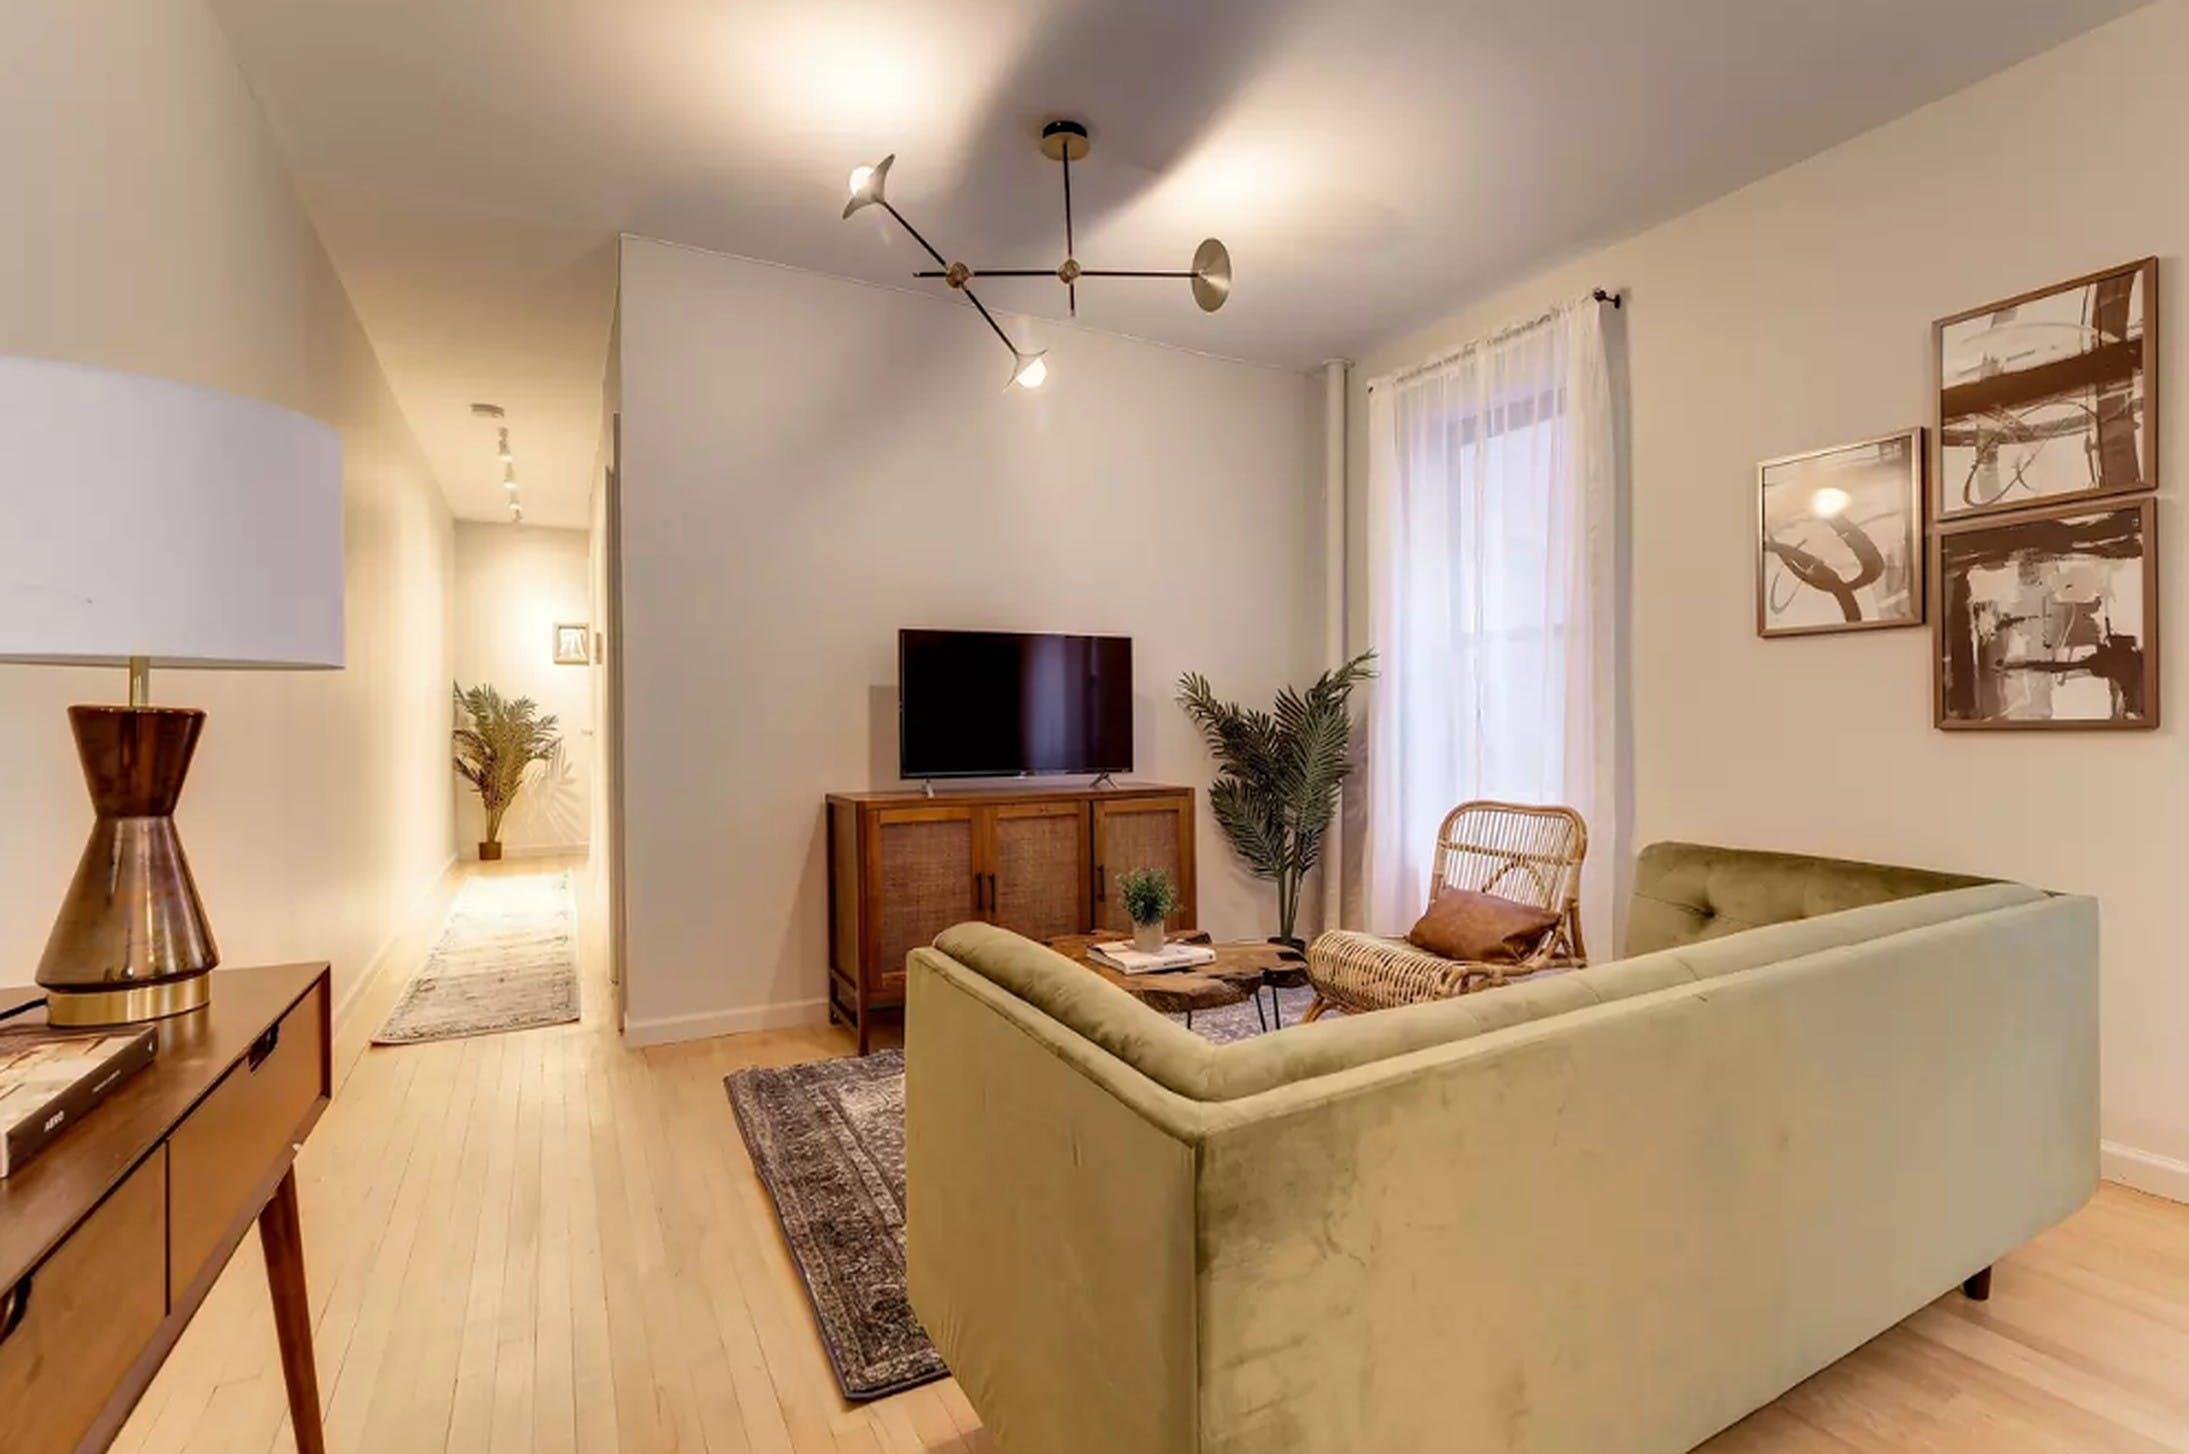 8 Residents   136th St. - West Harlem   Comfortable Elegant Apt.